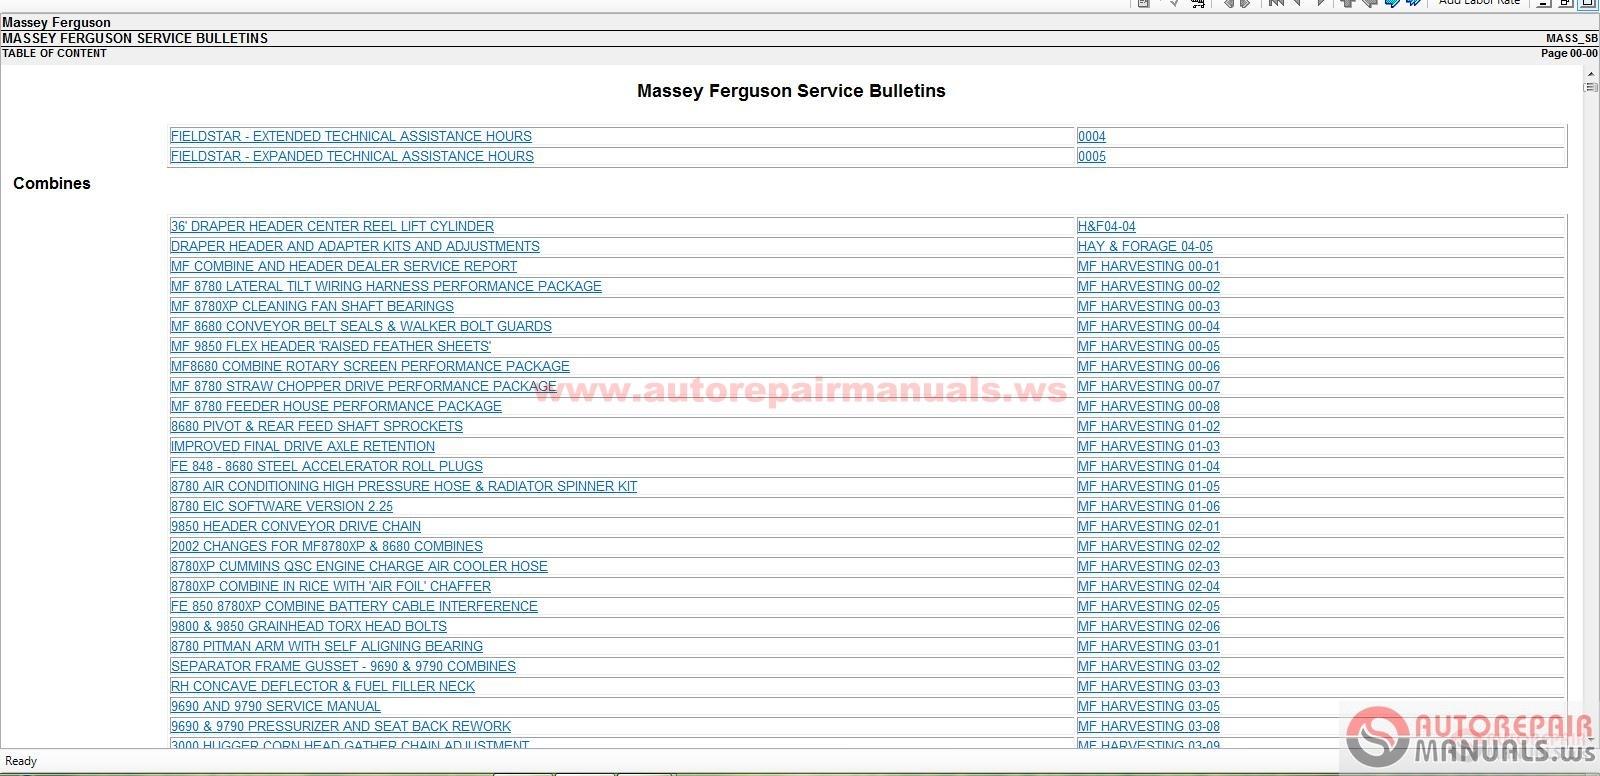 Massey Ferguson North America Service Manuals 03 2015